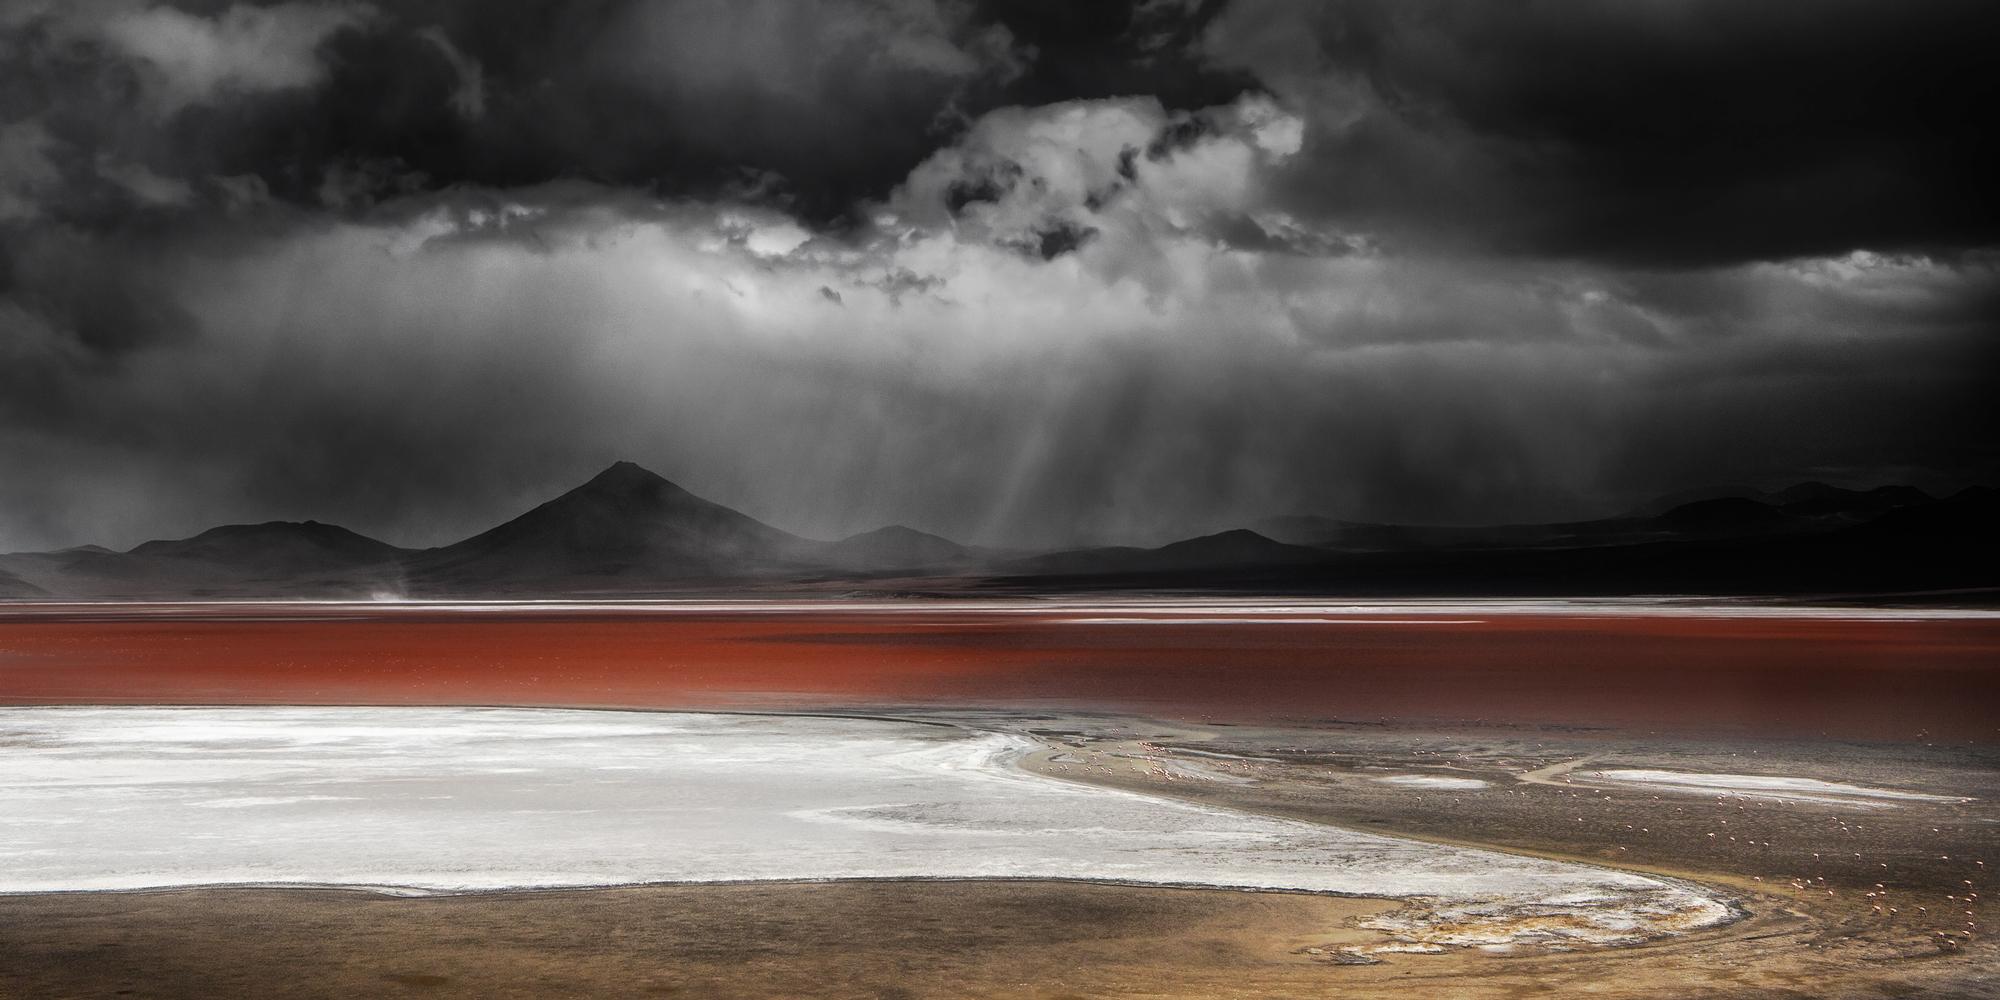 Laguna Storm - Bolivia 2011